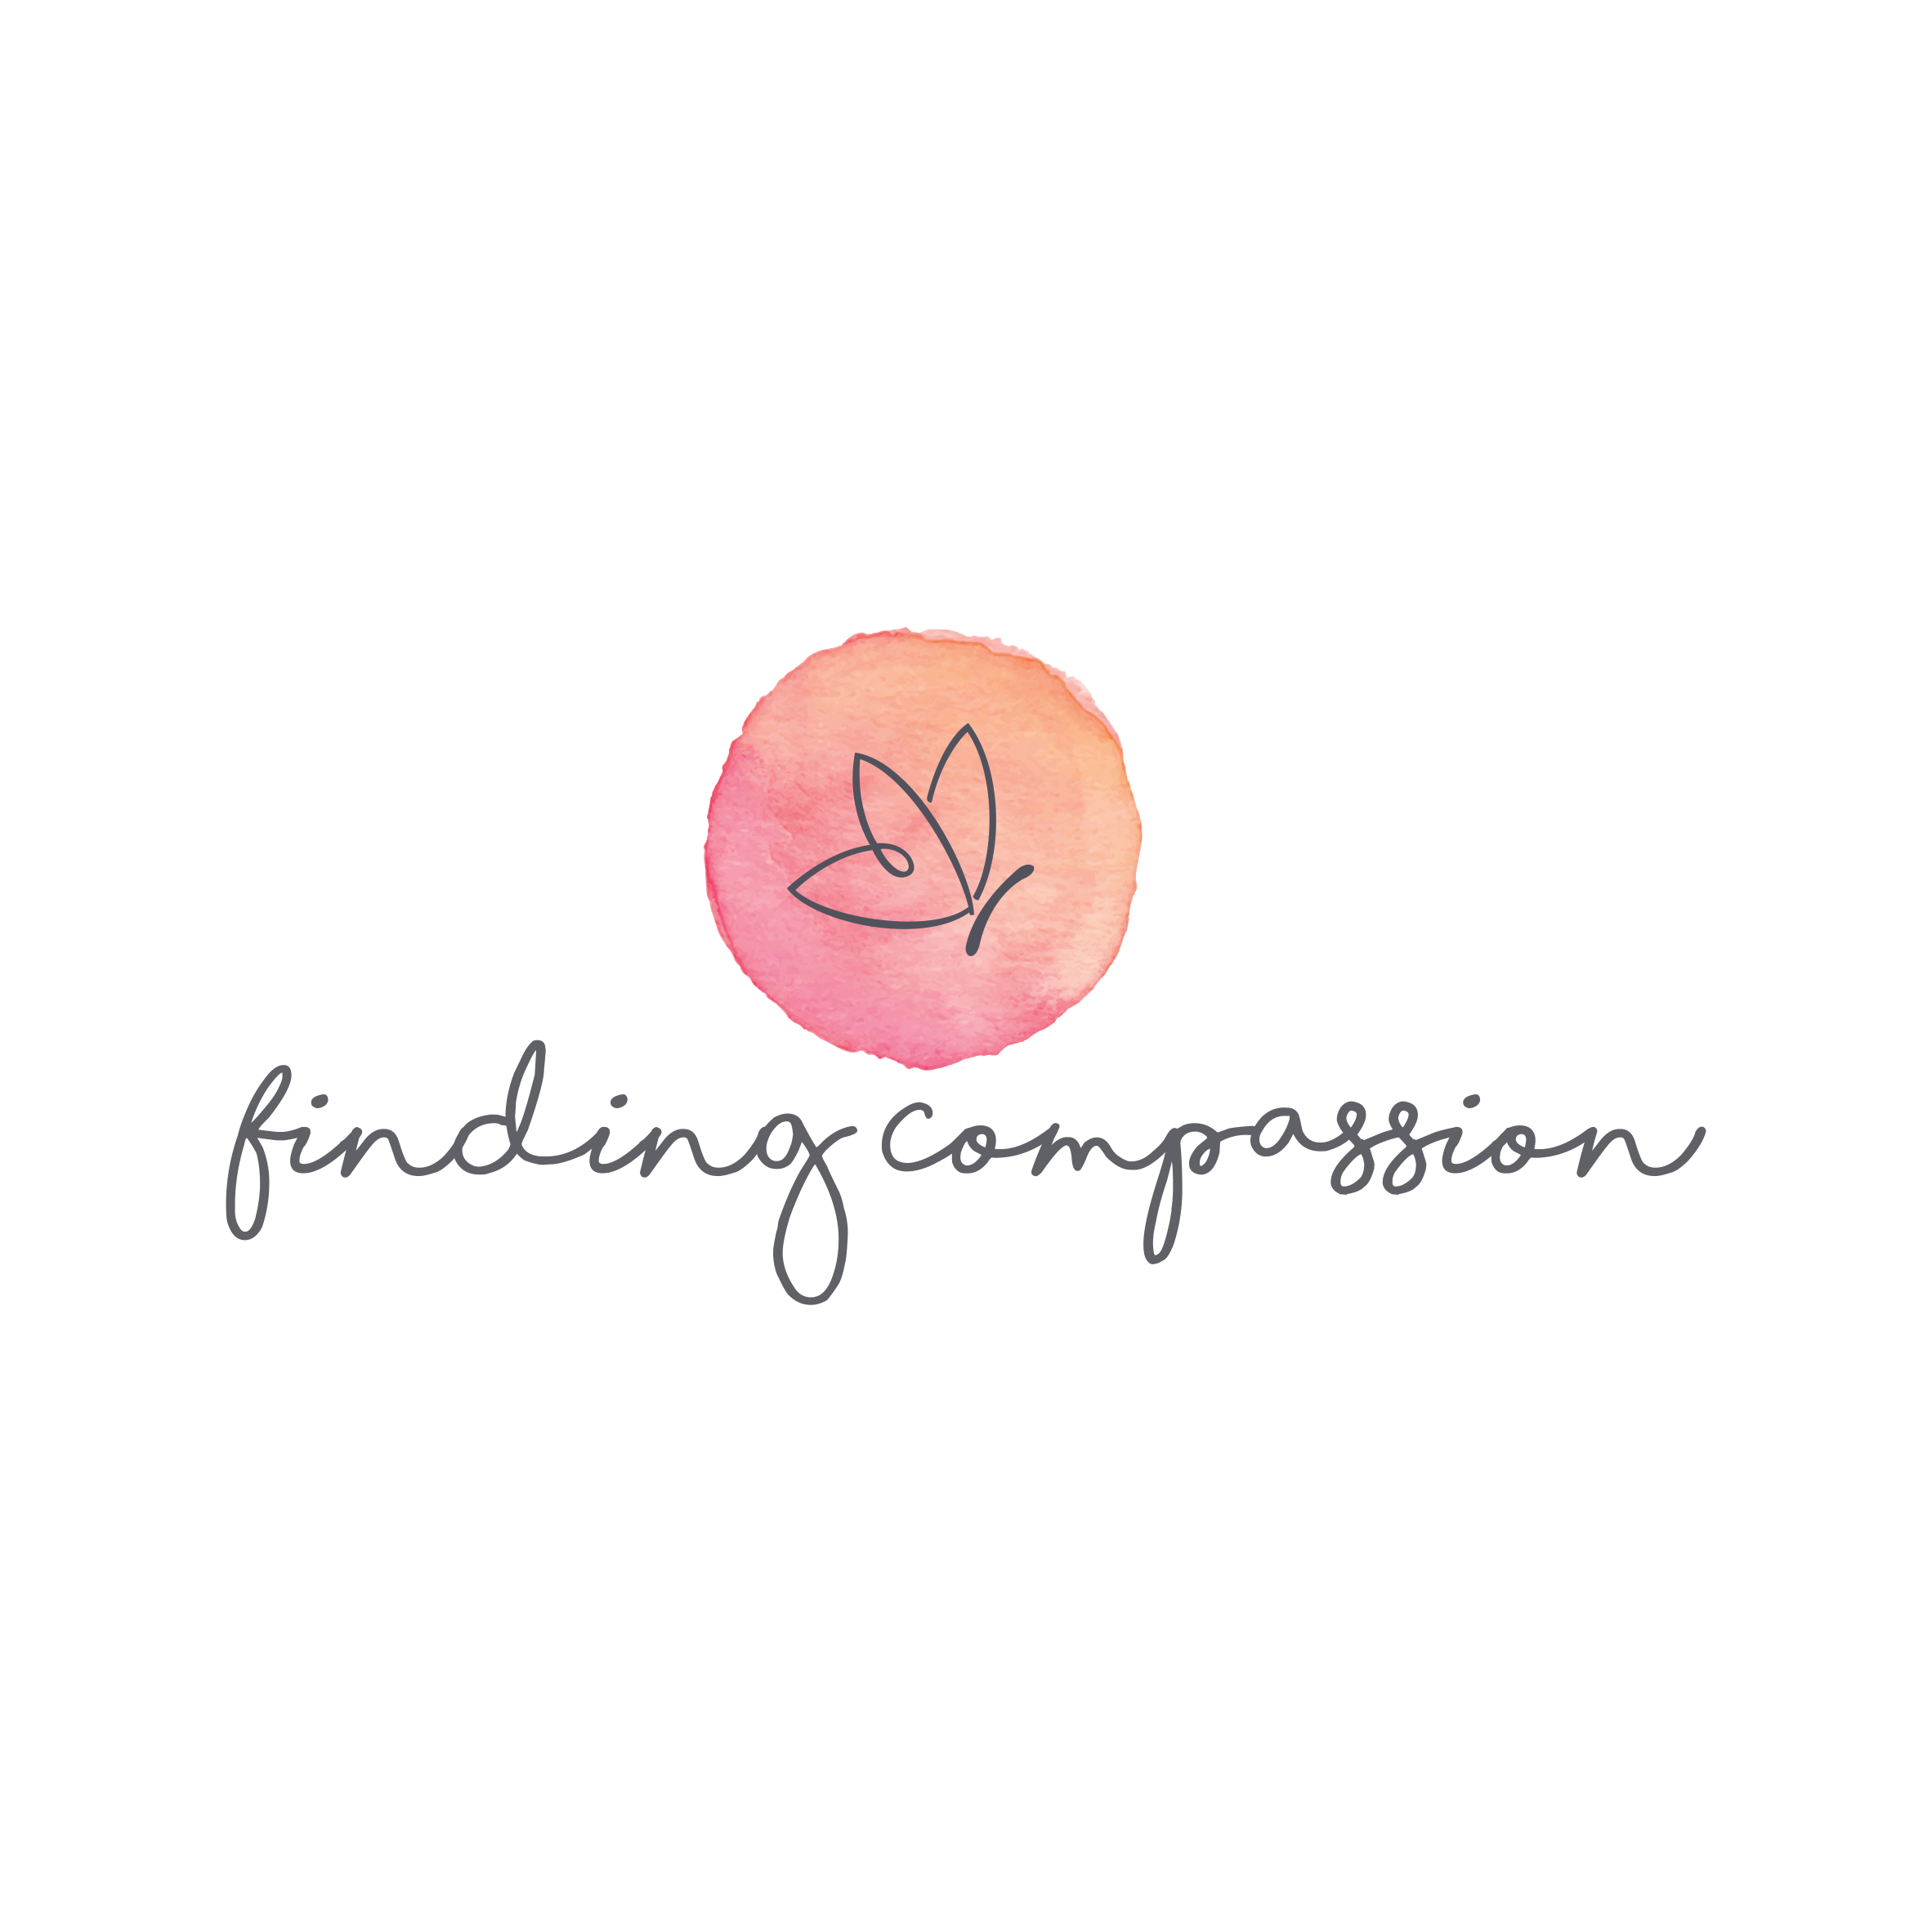 Self-Help blog needs a flirty and girly logo